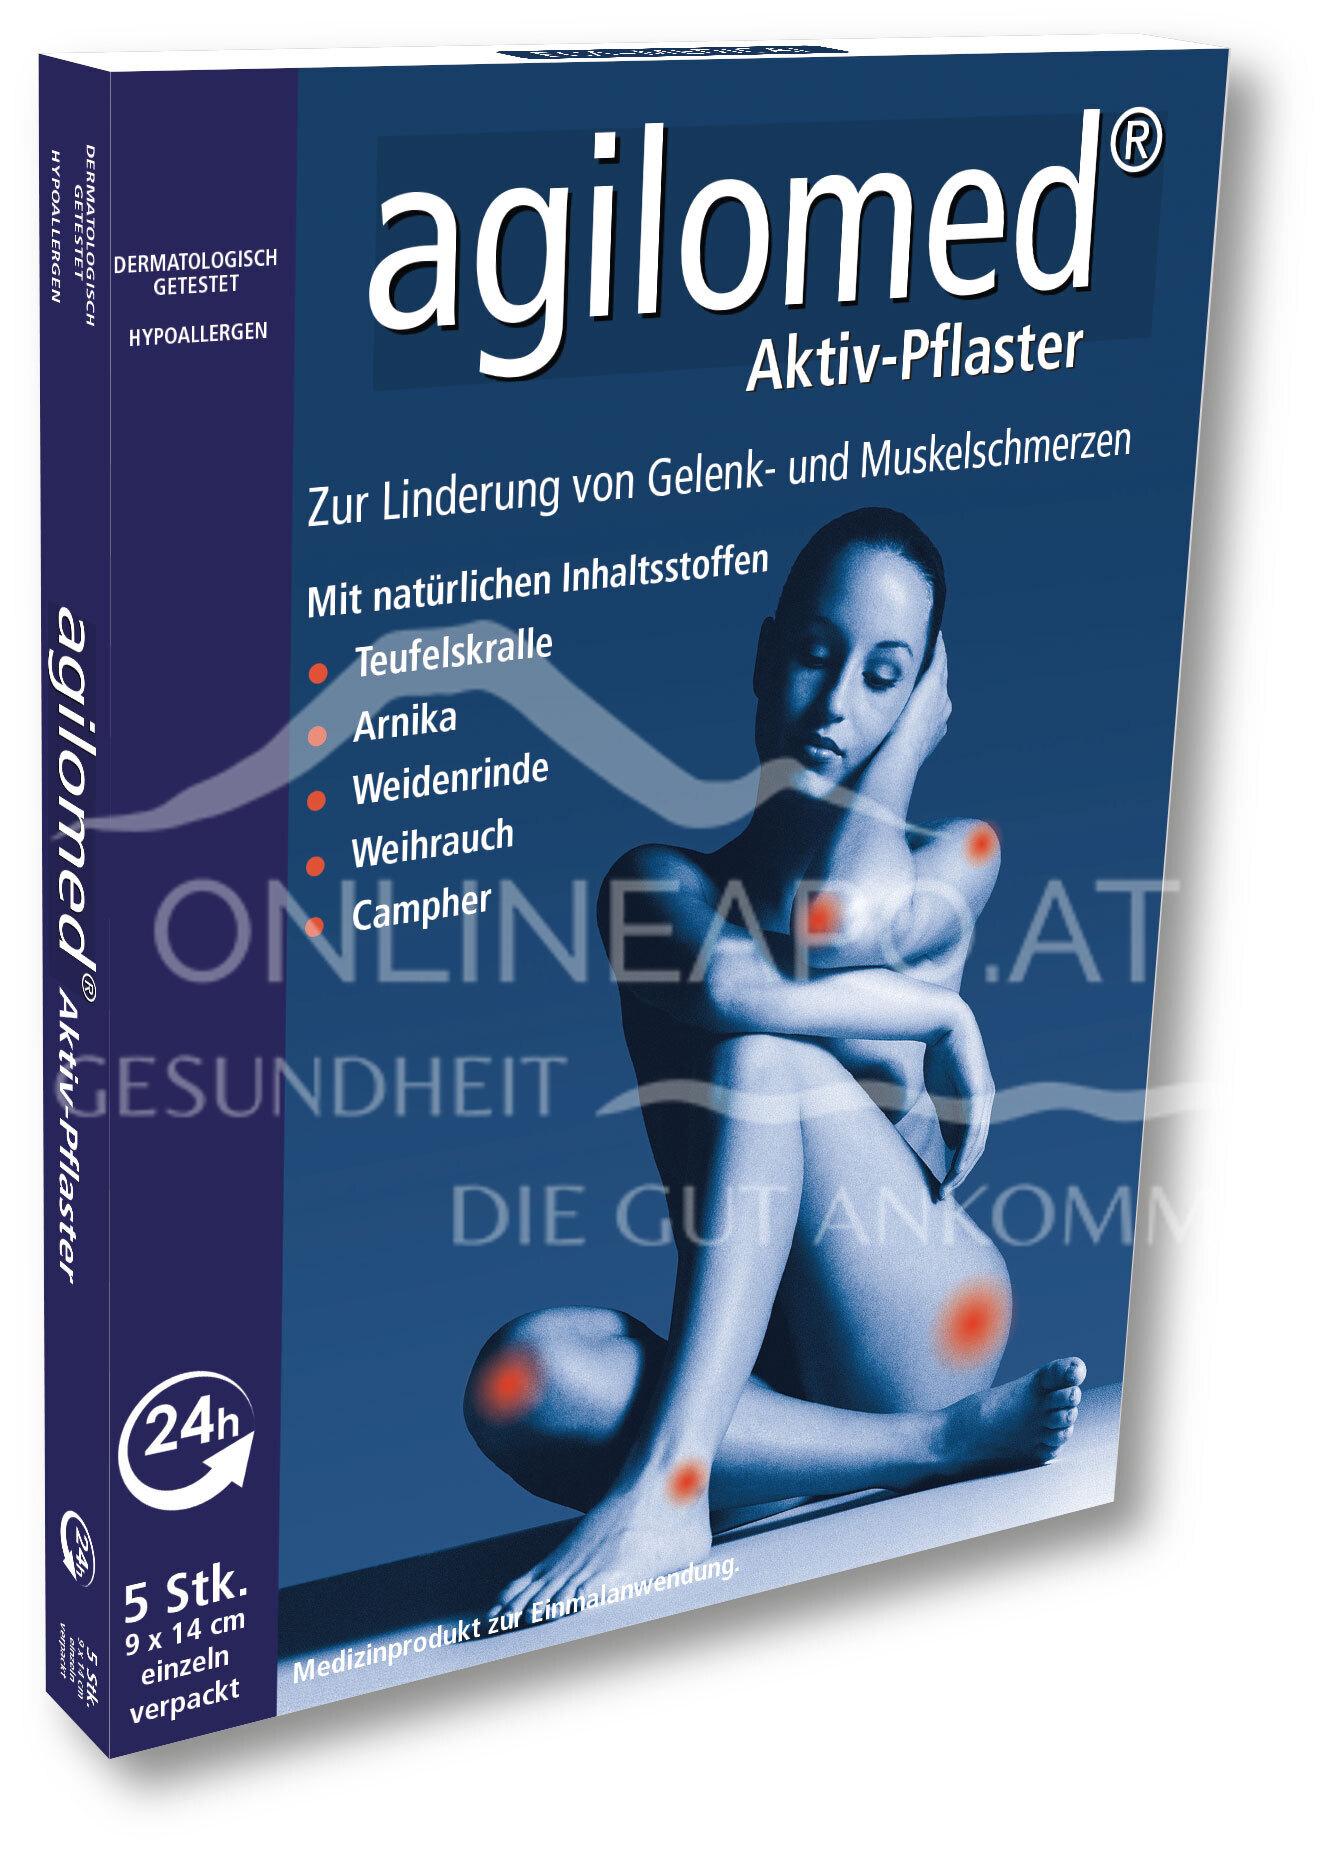 agilomed®Aktiv-Pflaster